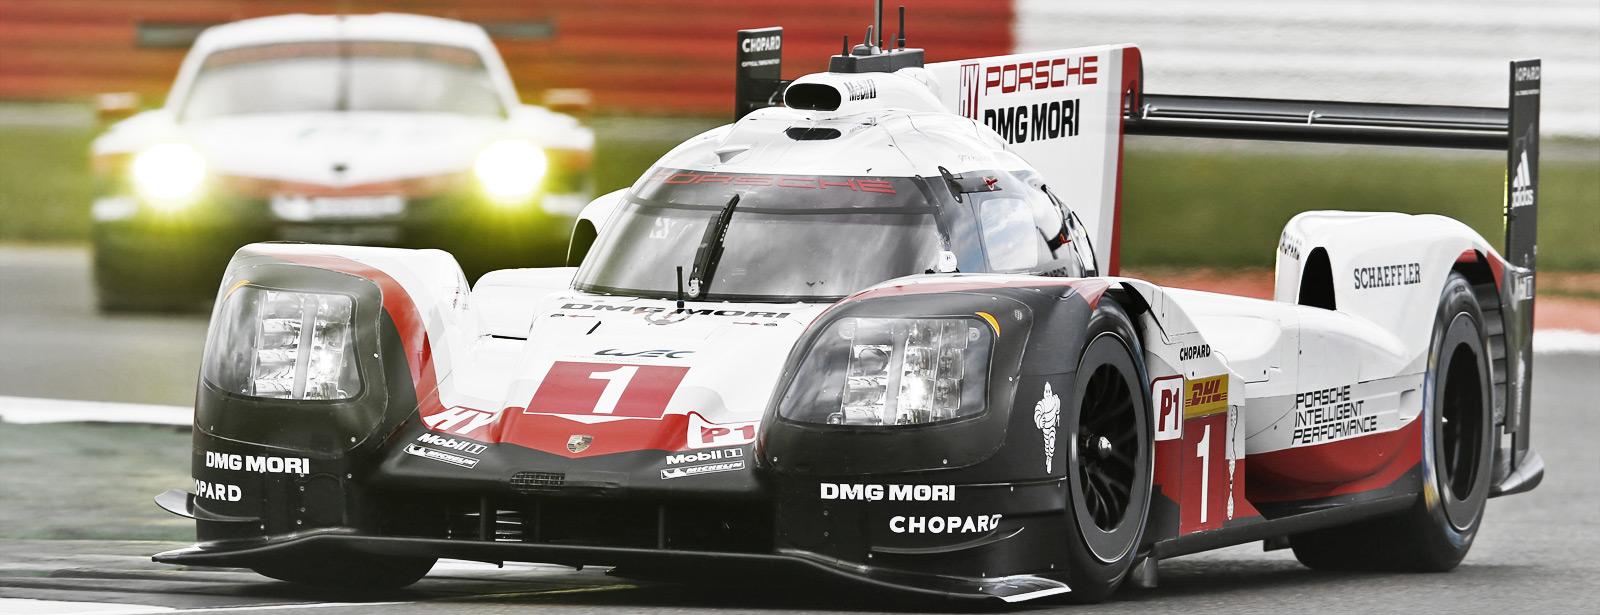 Porsche - FIA WEC 2017 - Silverstone - Race